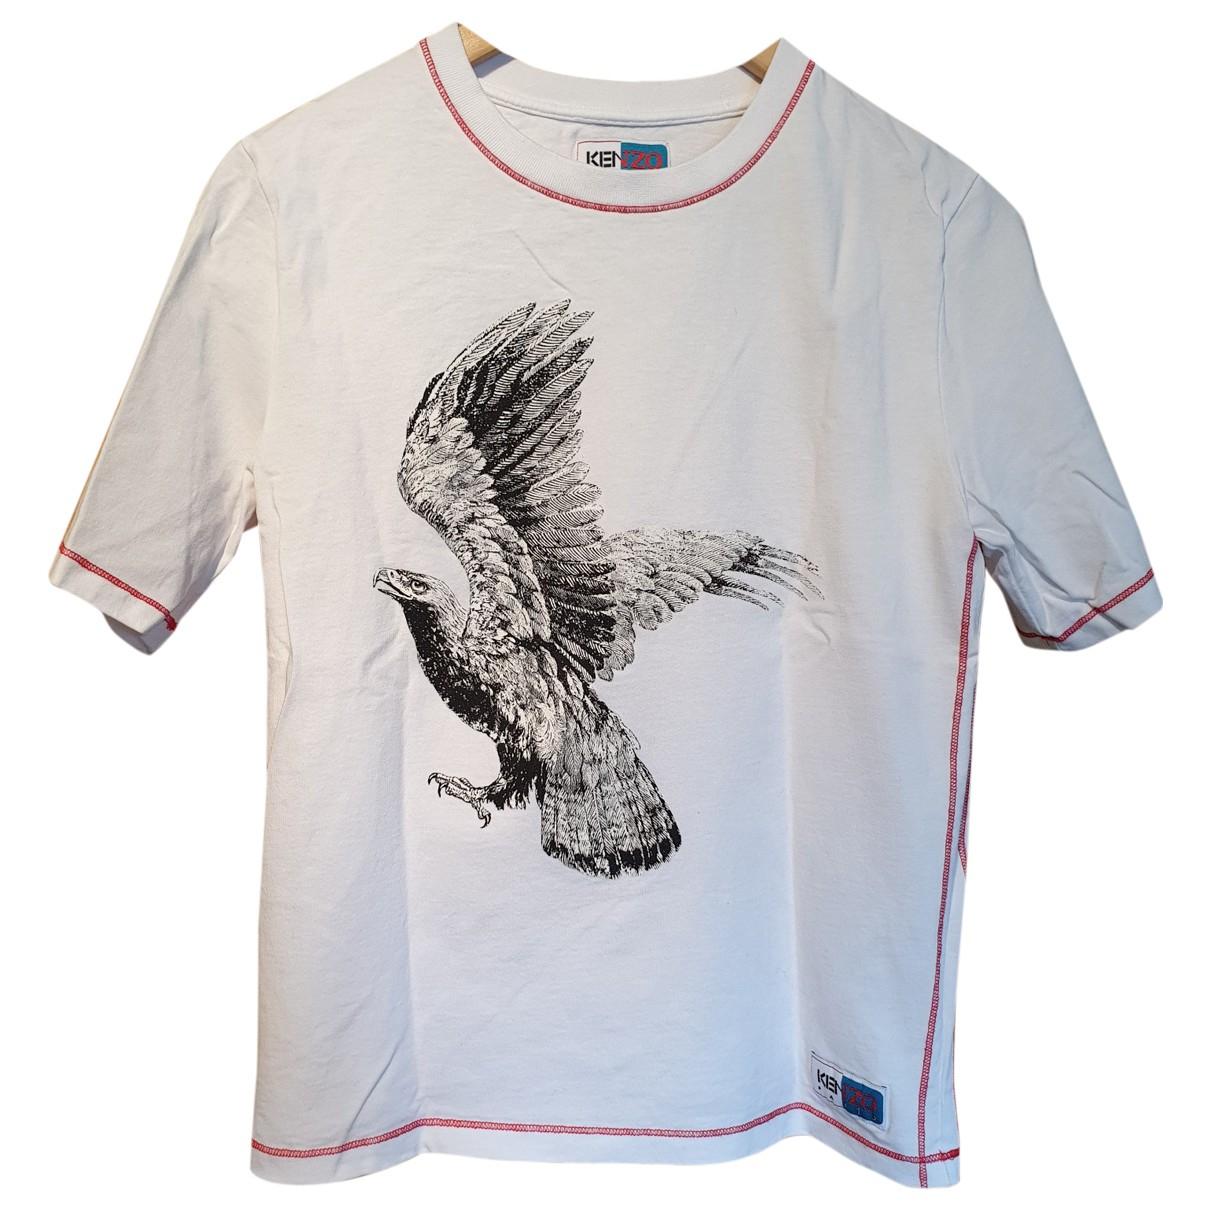 Kenzo \N T-Shirts in  Weiss Baumwolle